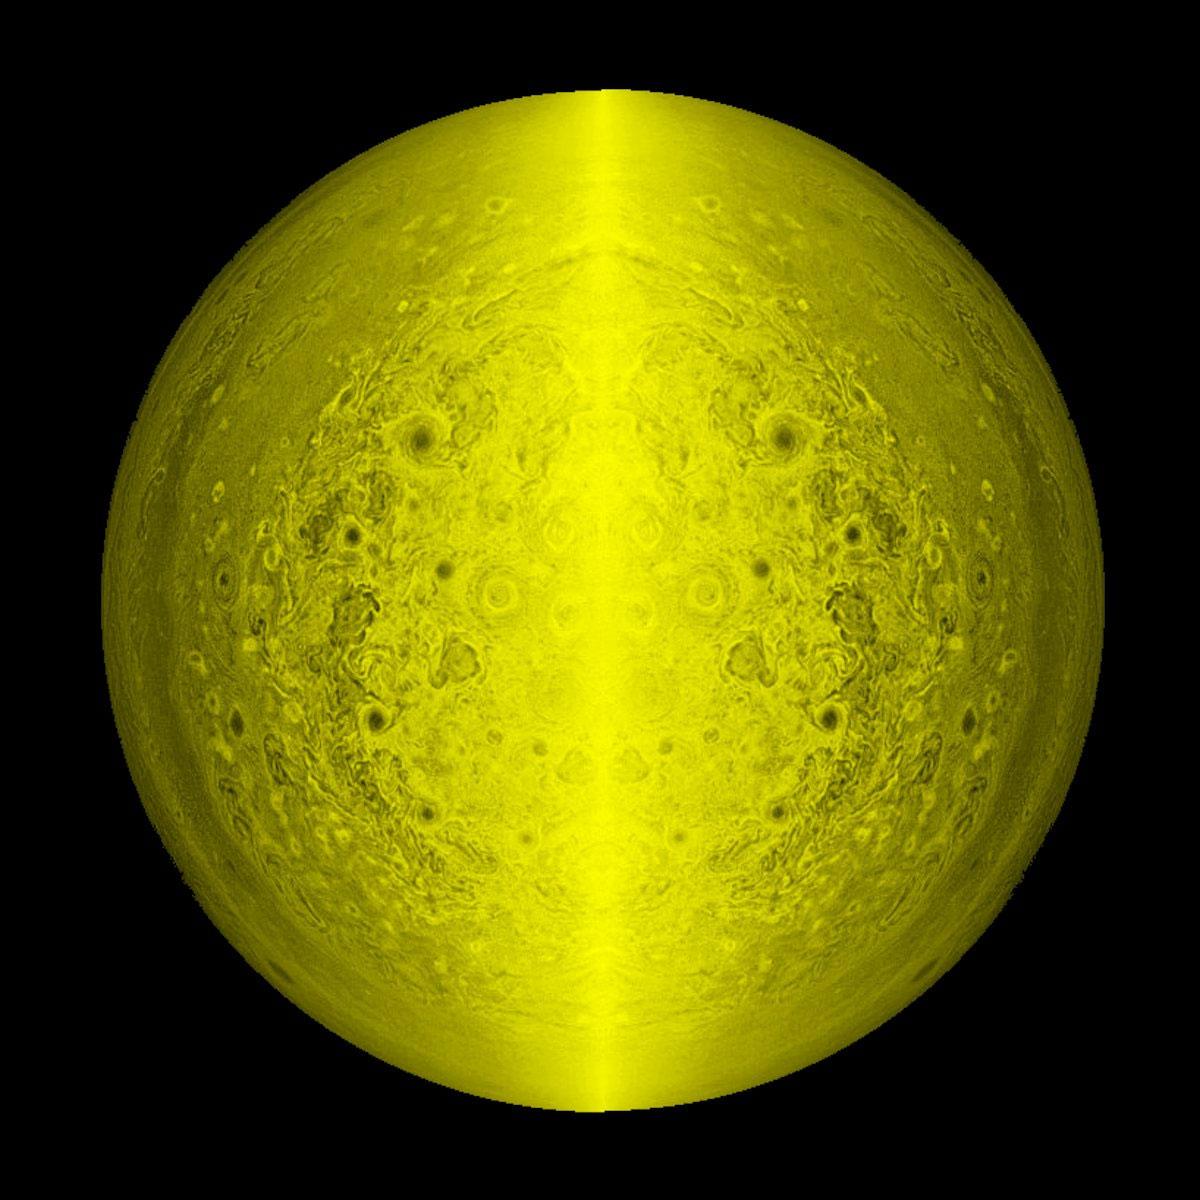 [NASA/JPL-Caltech]